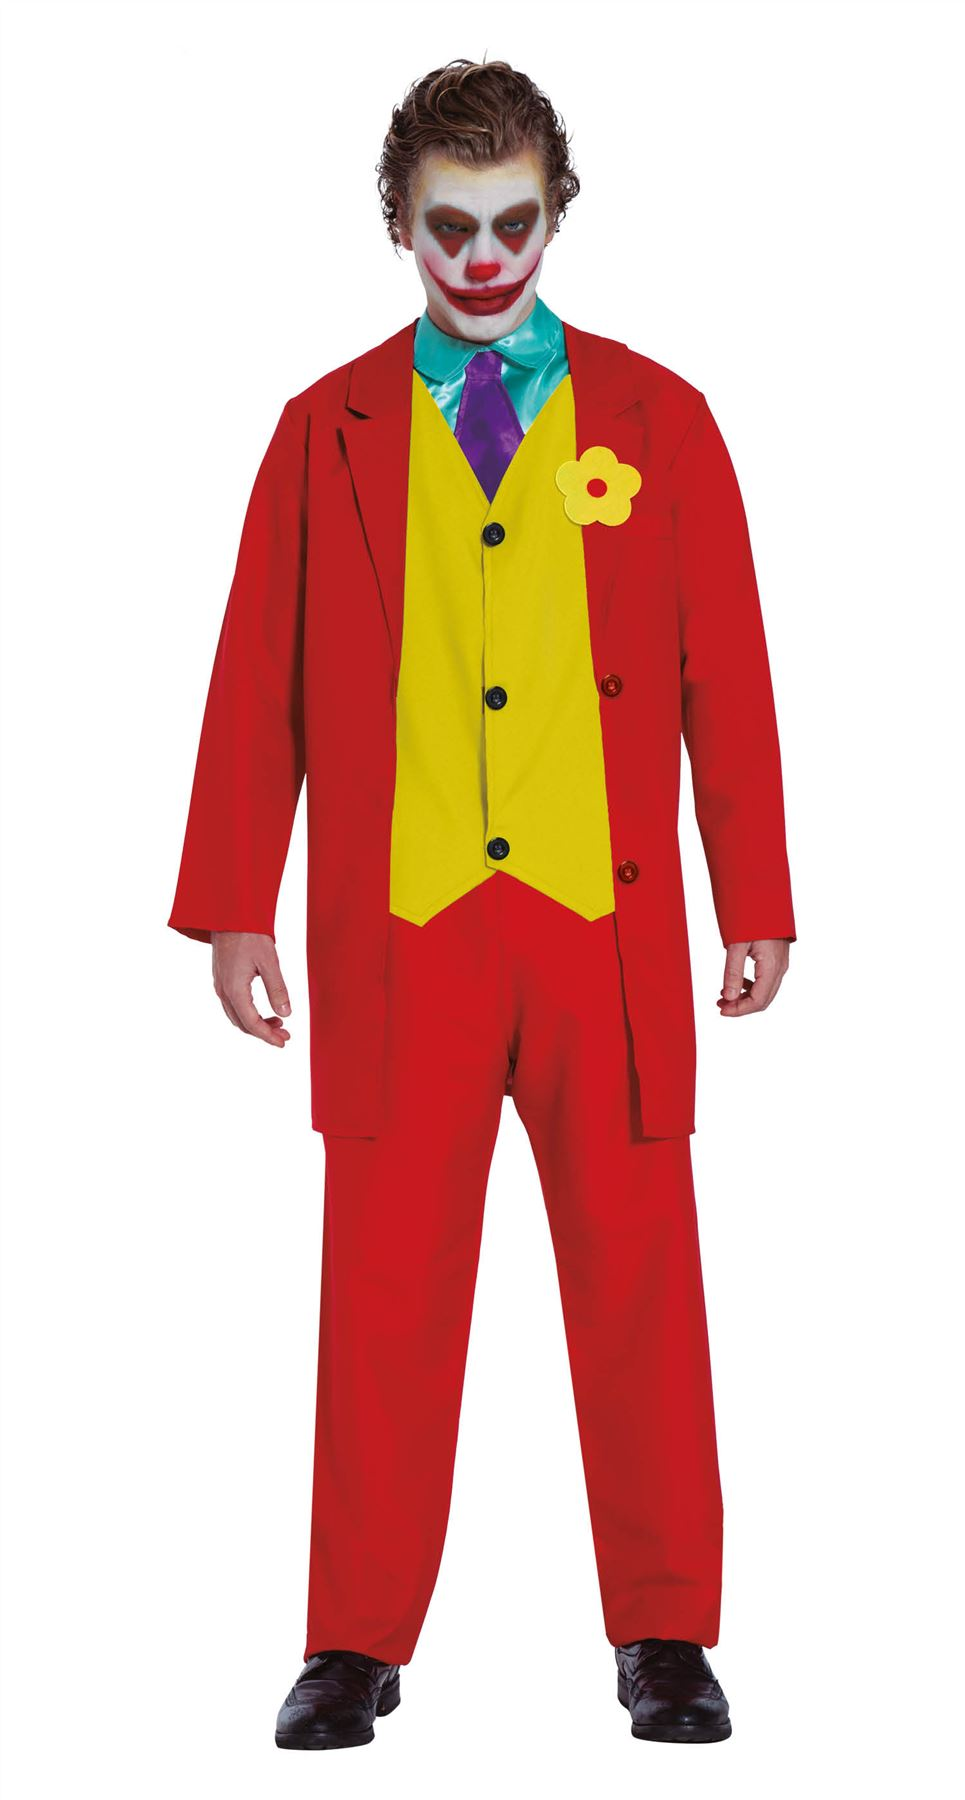 Fiestas Guirca Nuclear Suit Halloween Child Fancy Dress Costume